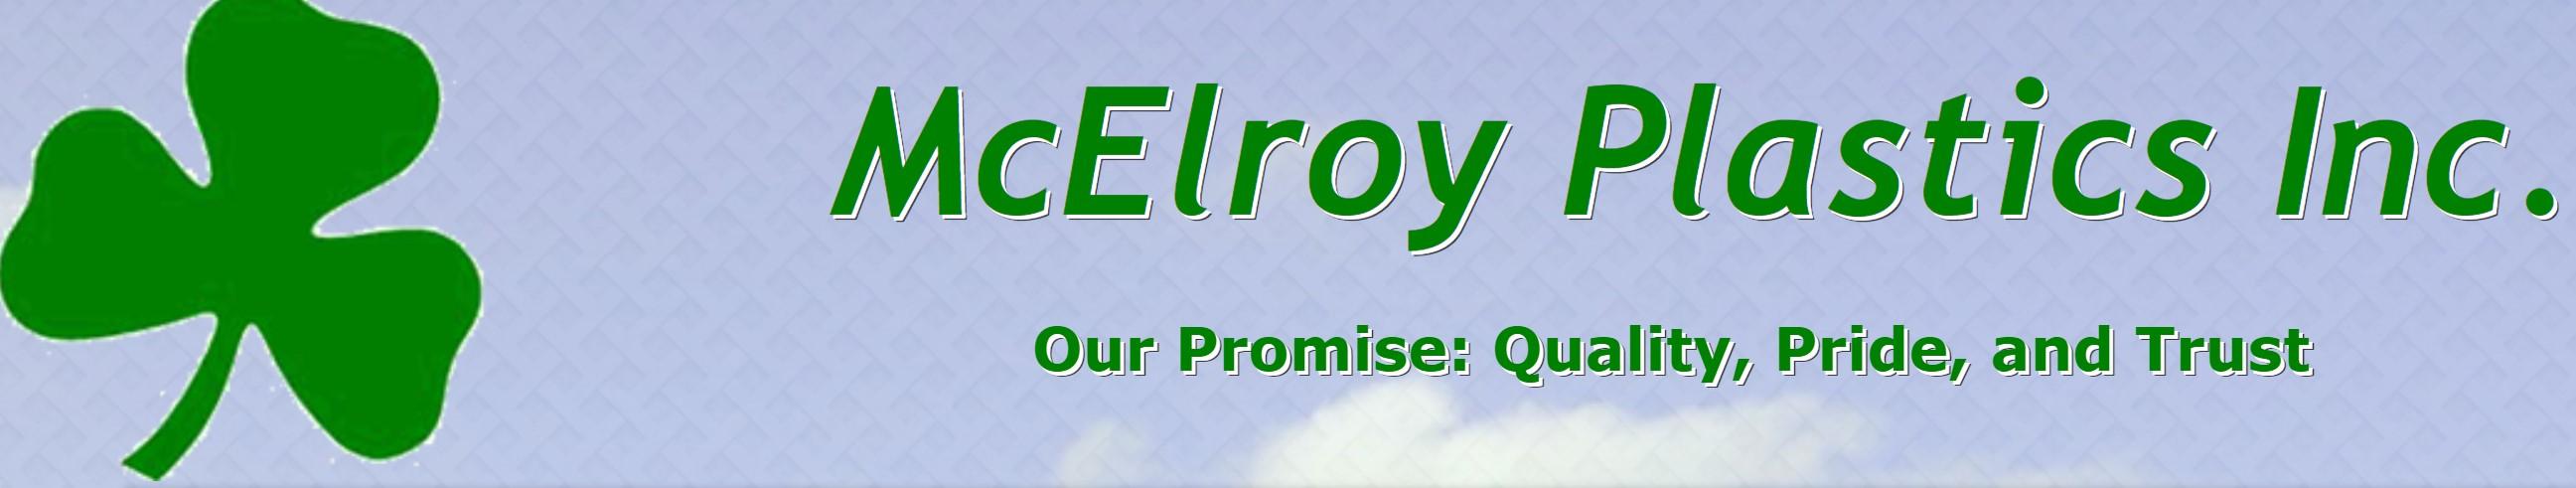 McElroy Plastics header logo.